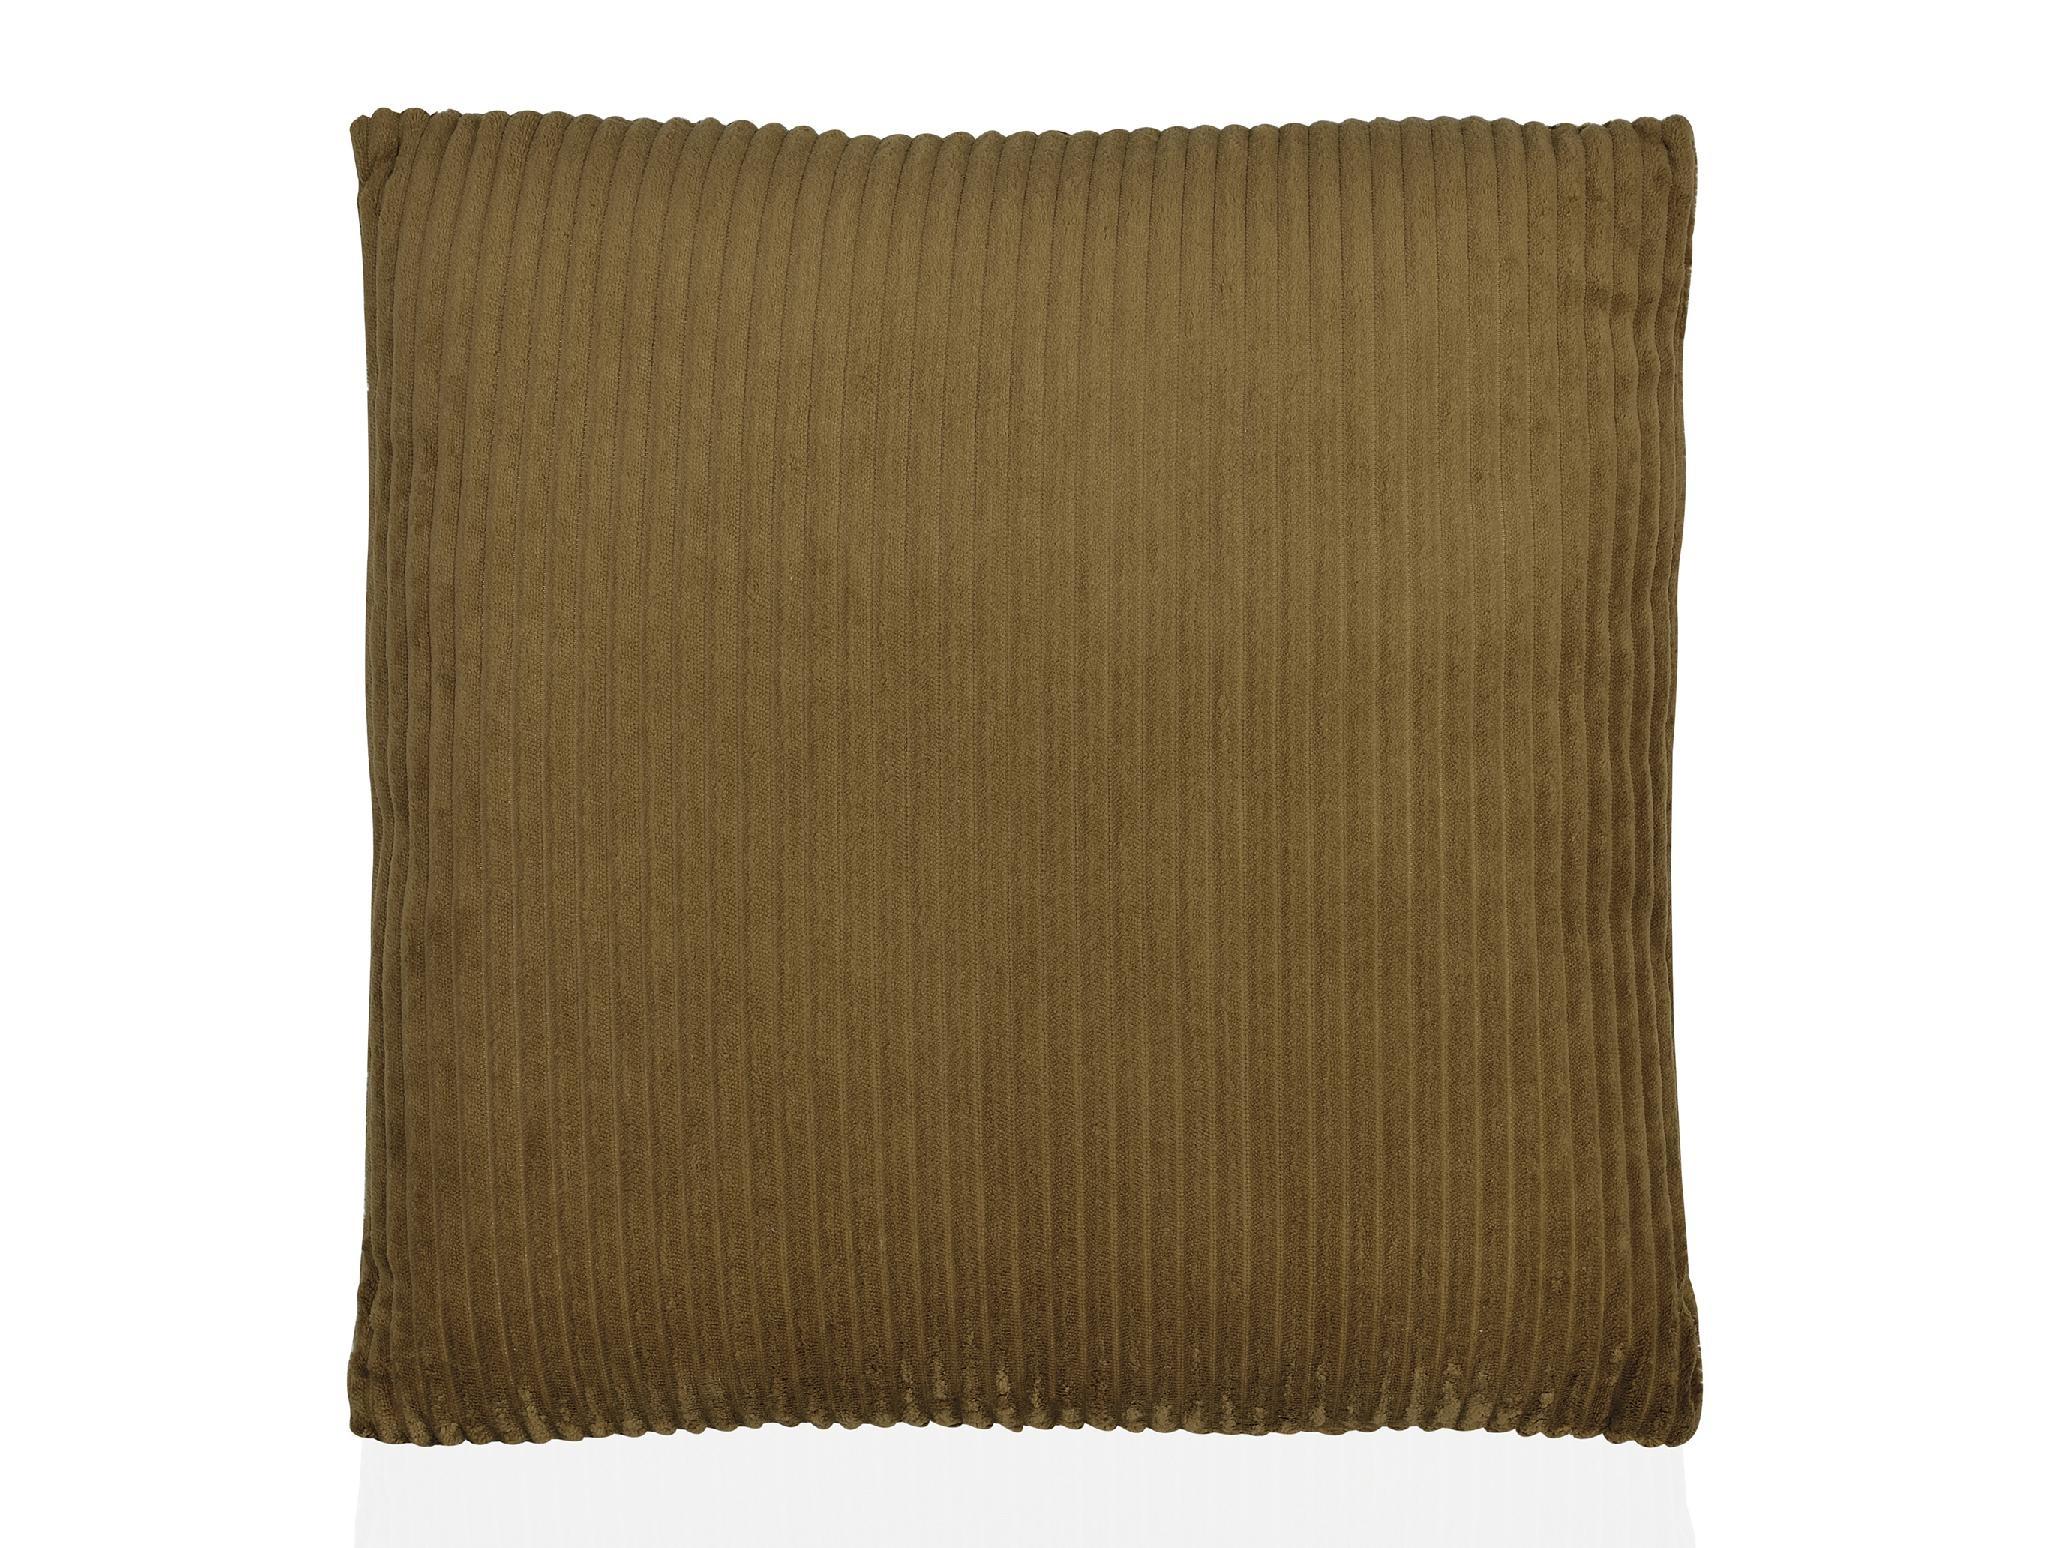 Kussen Dark Beige Corduroy Velvet - 45 x 45 cm-1